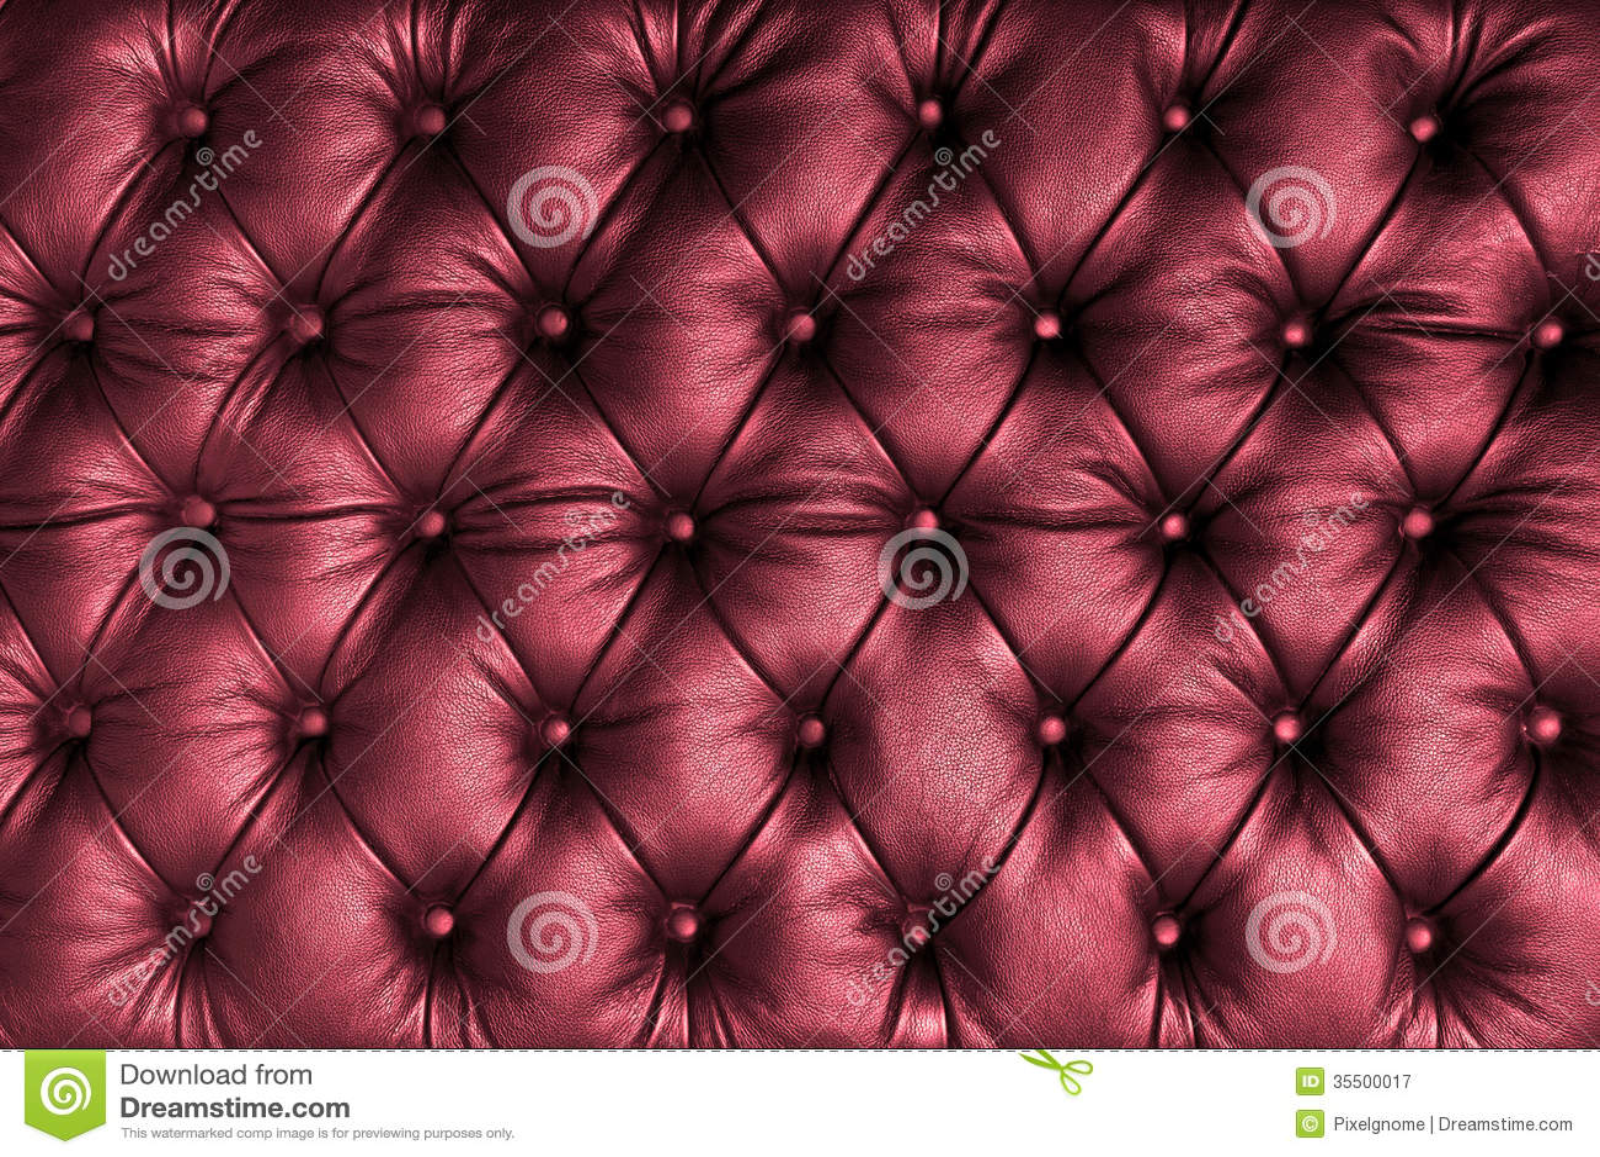 rot tuffted leder mit kn pfen lizenzfreie stockfotografie. Black Bedroom Furniture Sets. Home Design Ideas